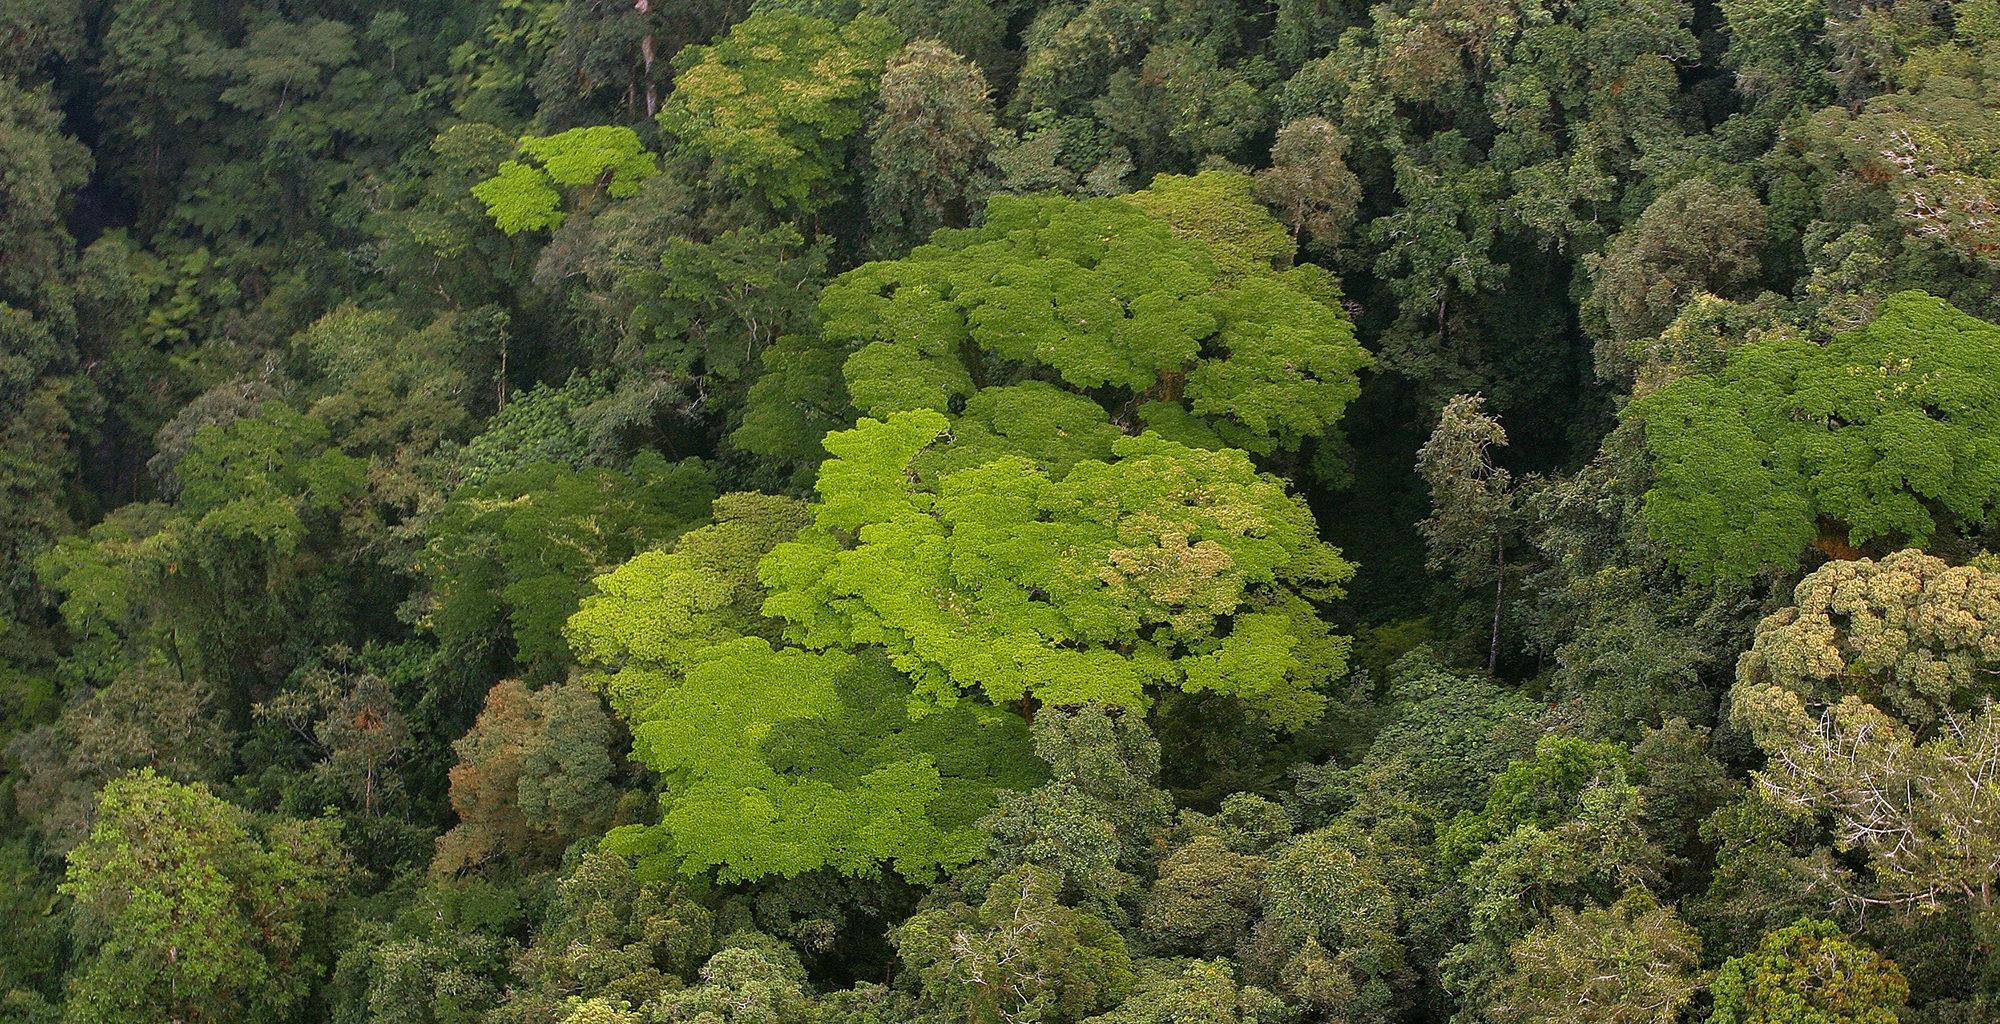 Rwanda-Nyungwe-National-Park-Forest-Aerial